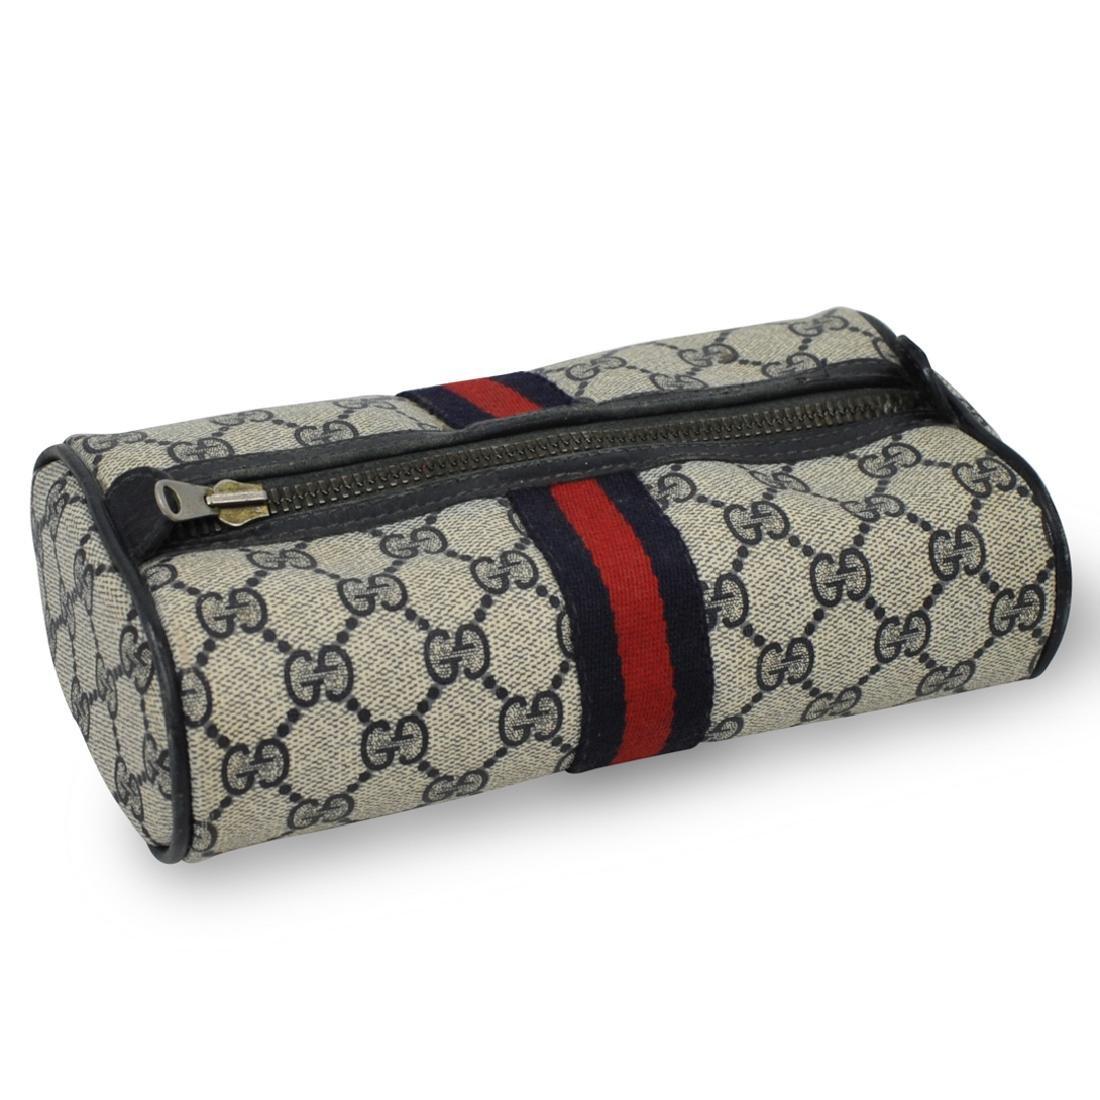 Gucci Monogram Canvas Travel Bag